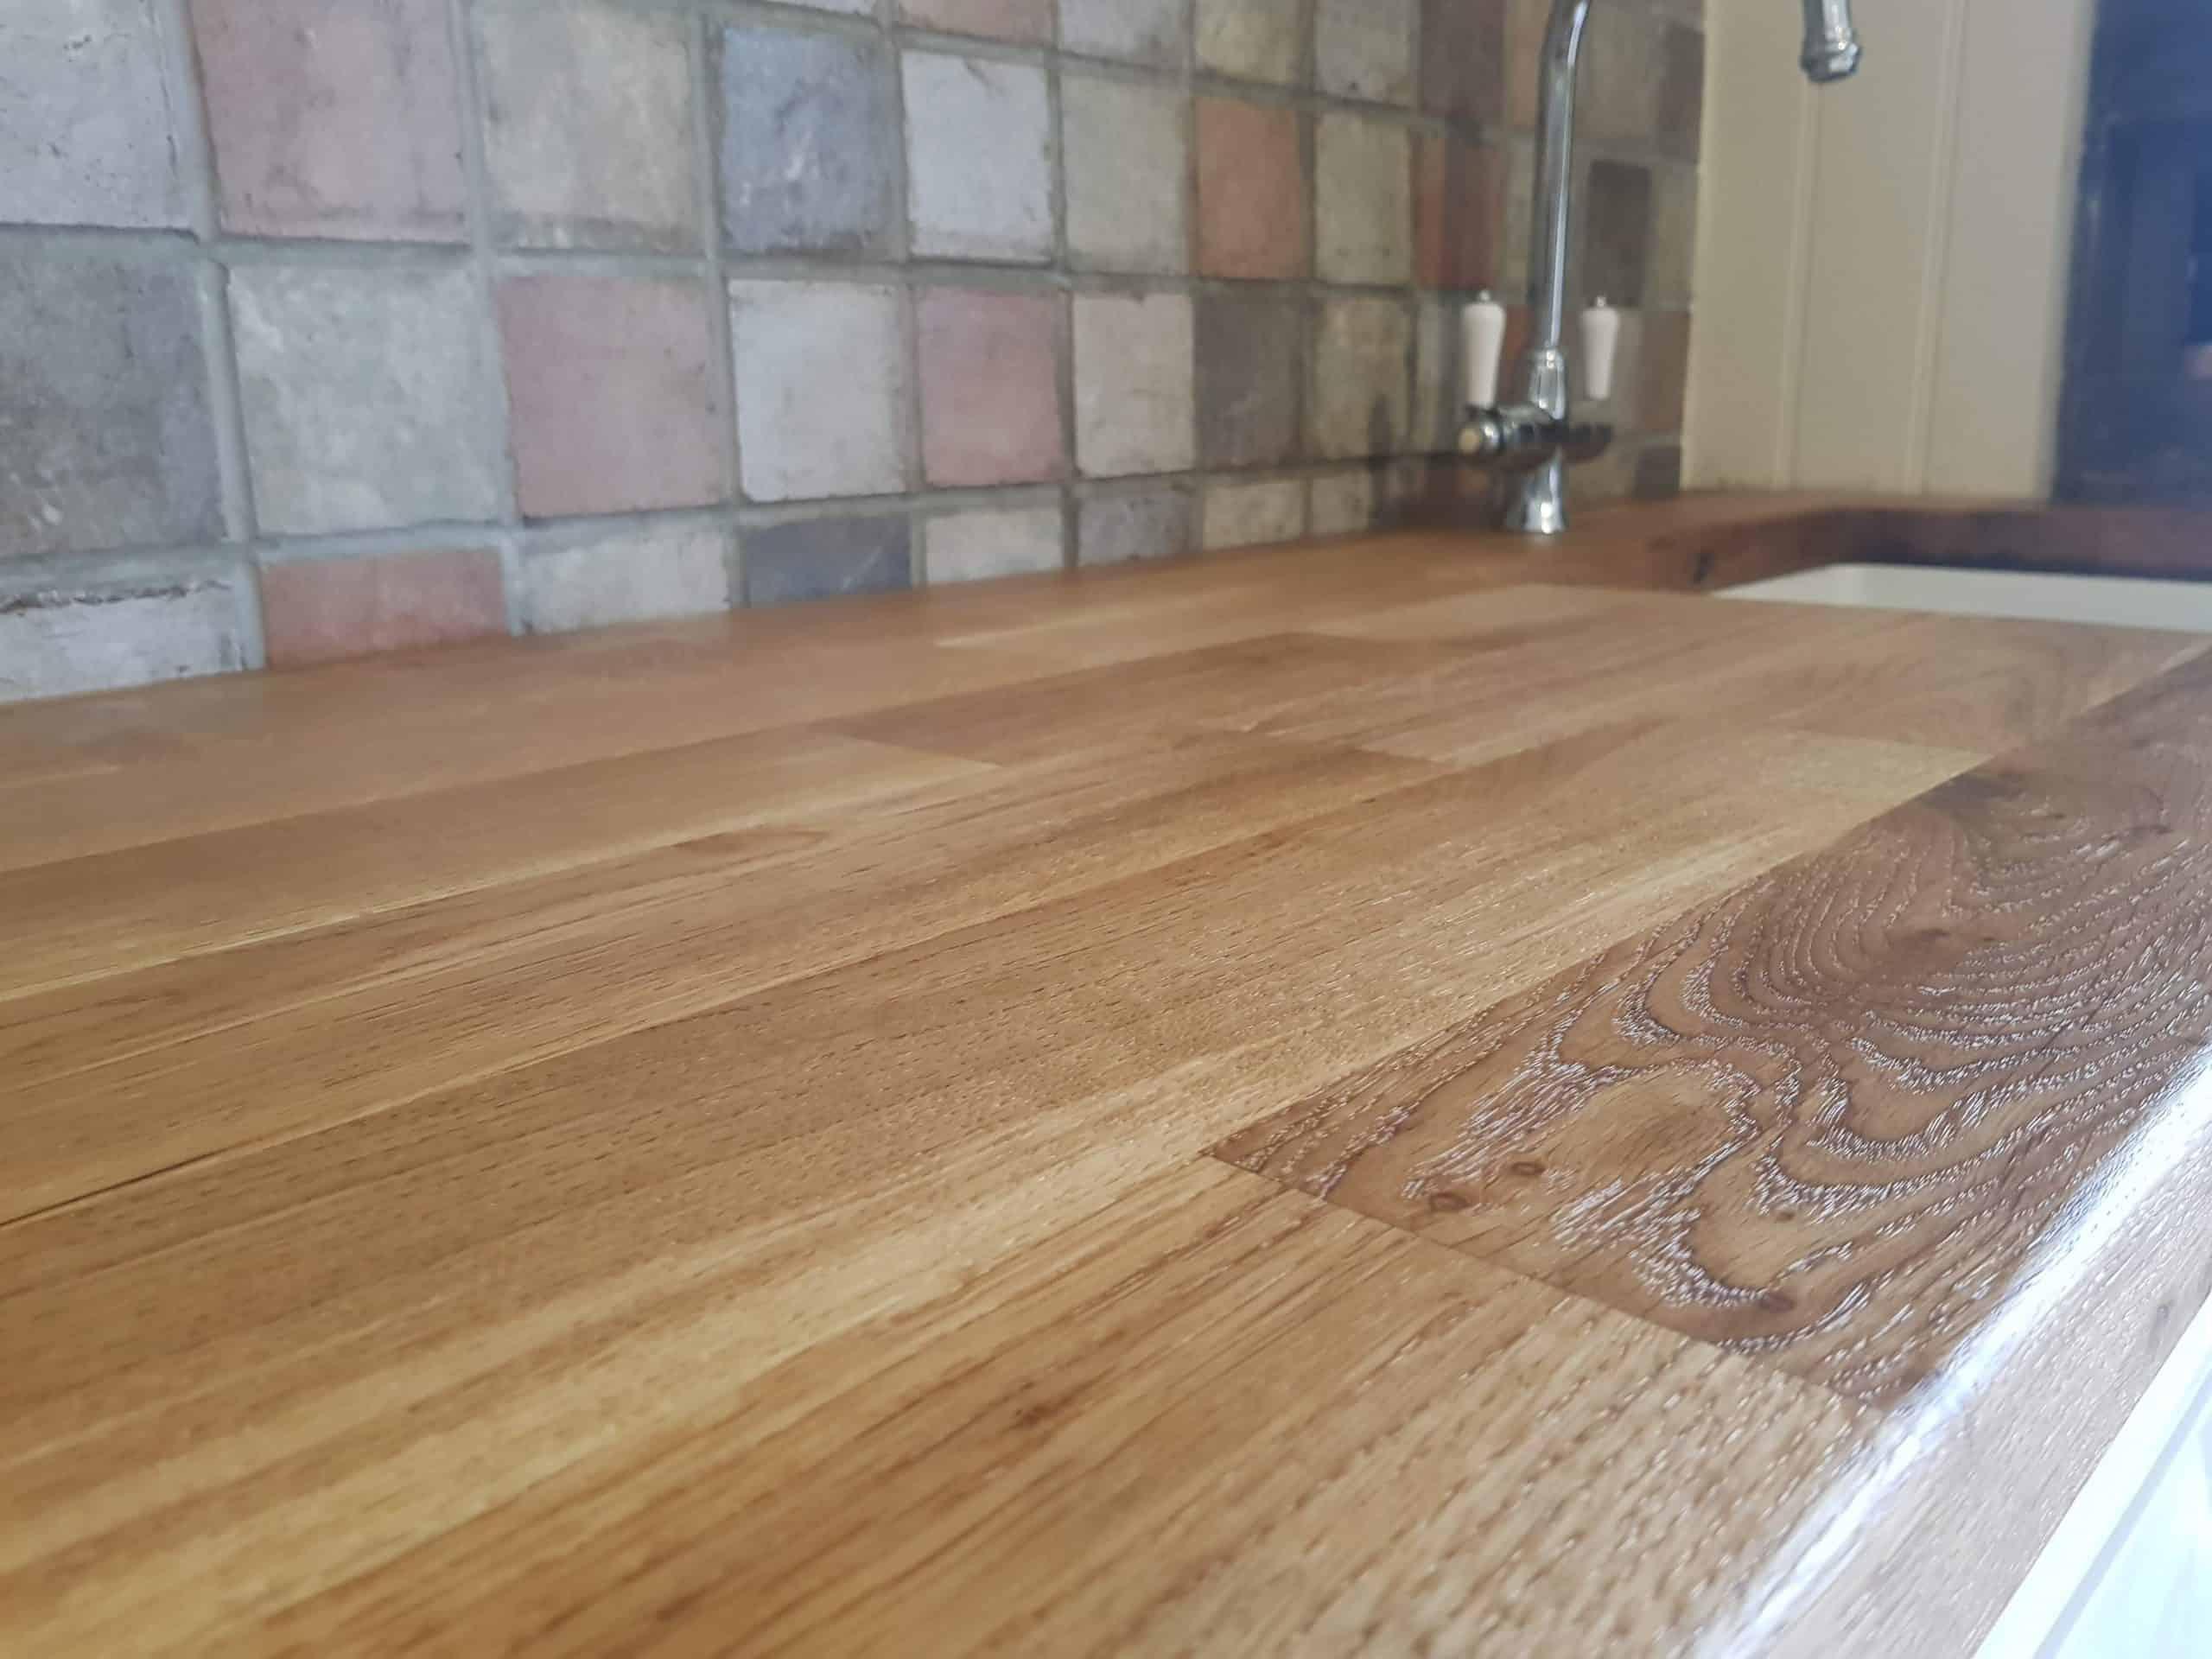 Oak Wooden Worktop Restoration